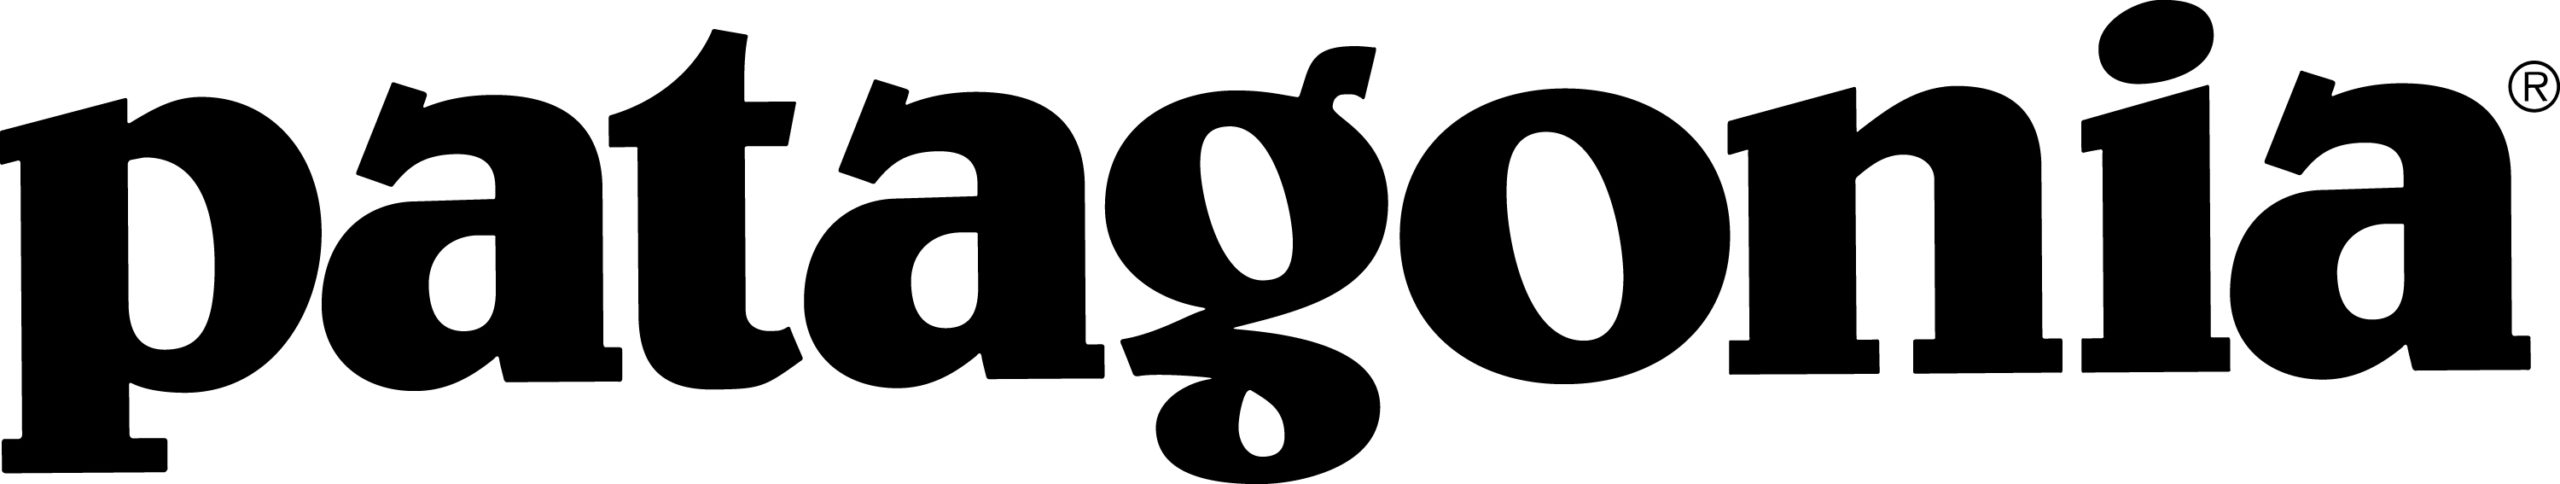 Patagonia word high res